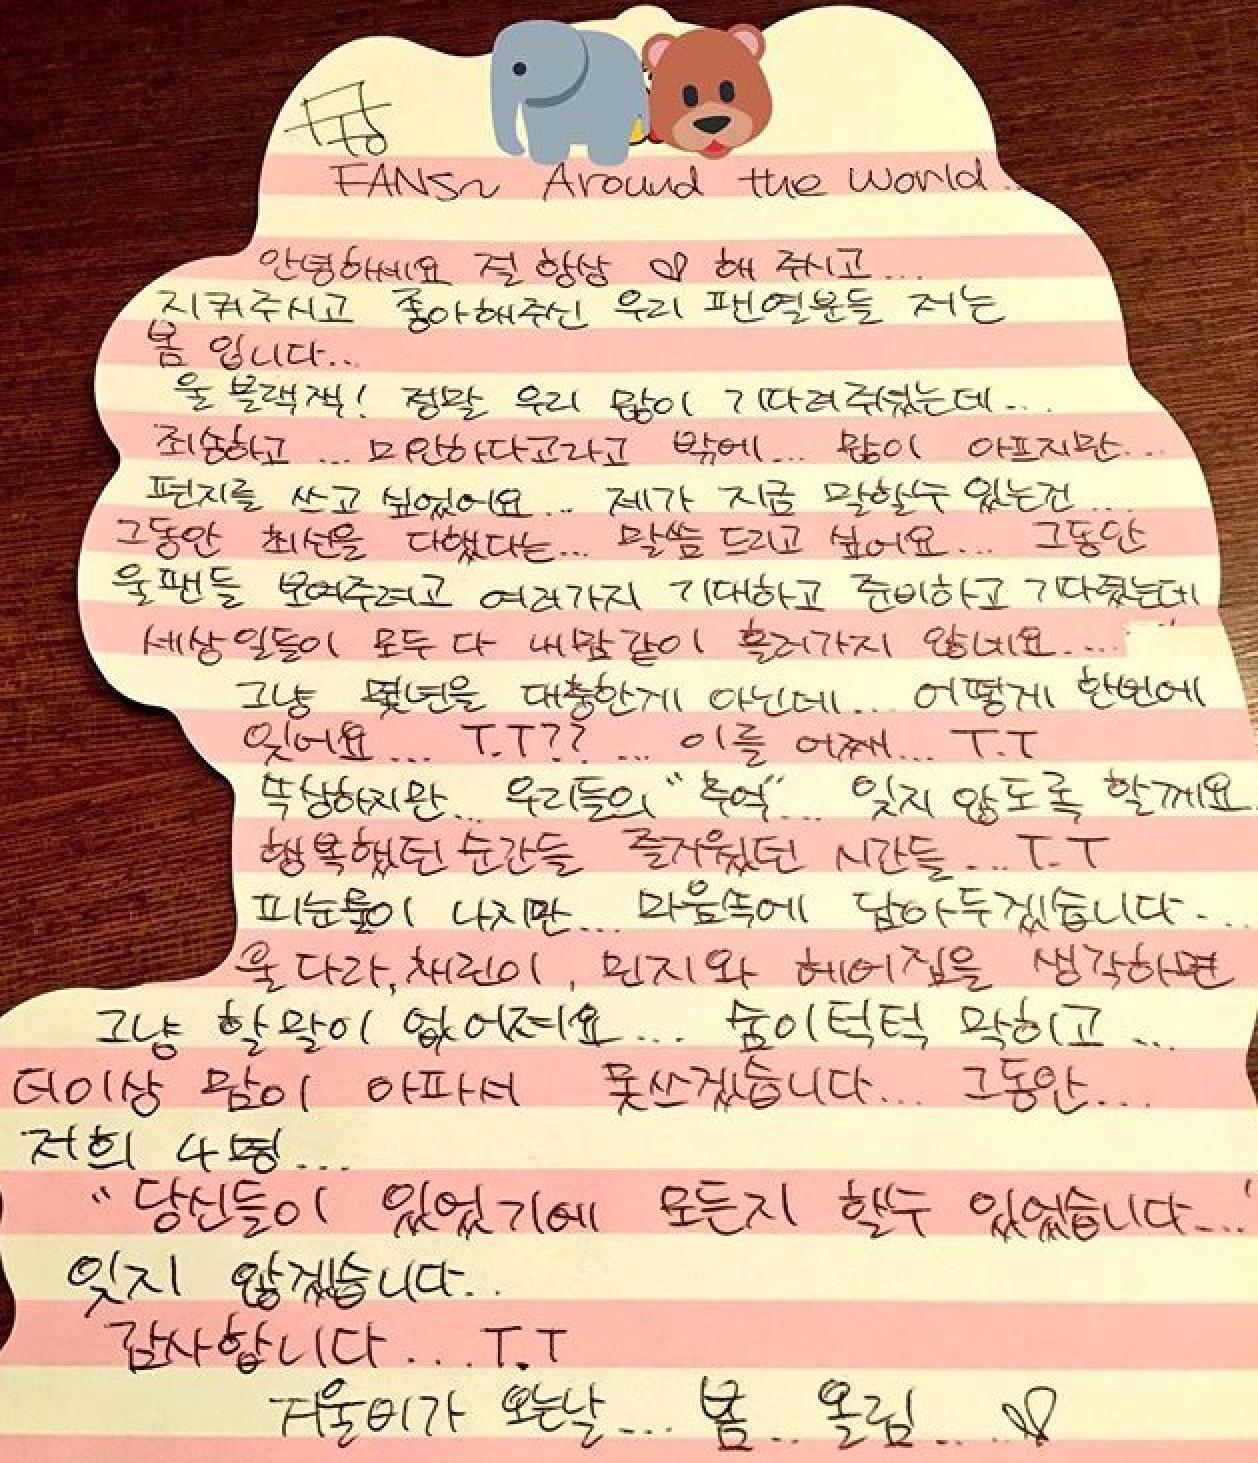 [2NE1] จดหมายจากปาร์คบอมถึง blackjack